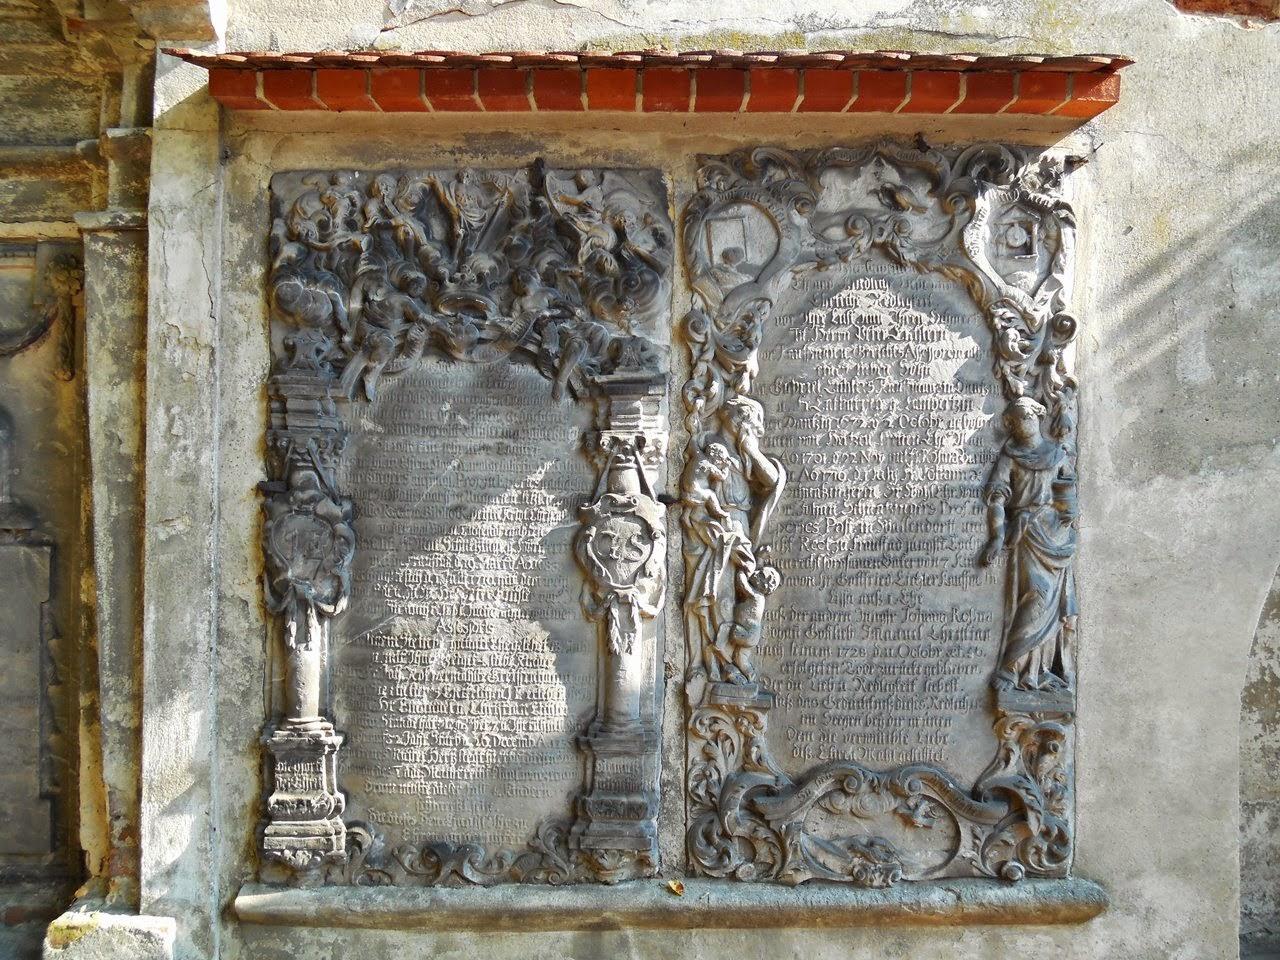 cmentarz ewangelicki we Wschhowie